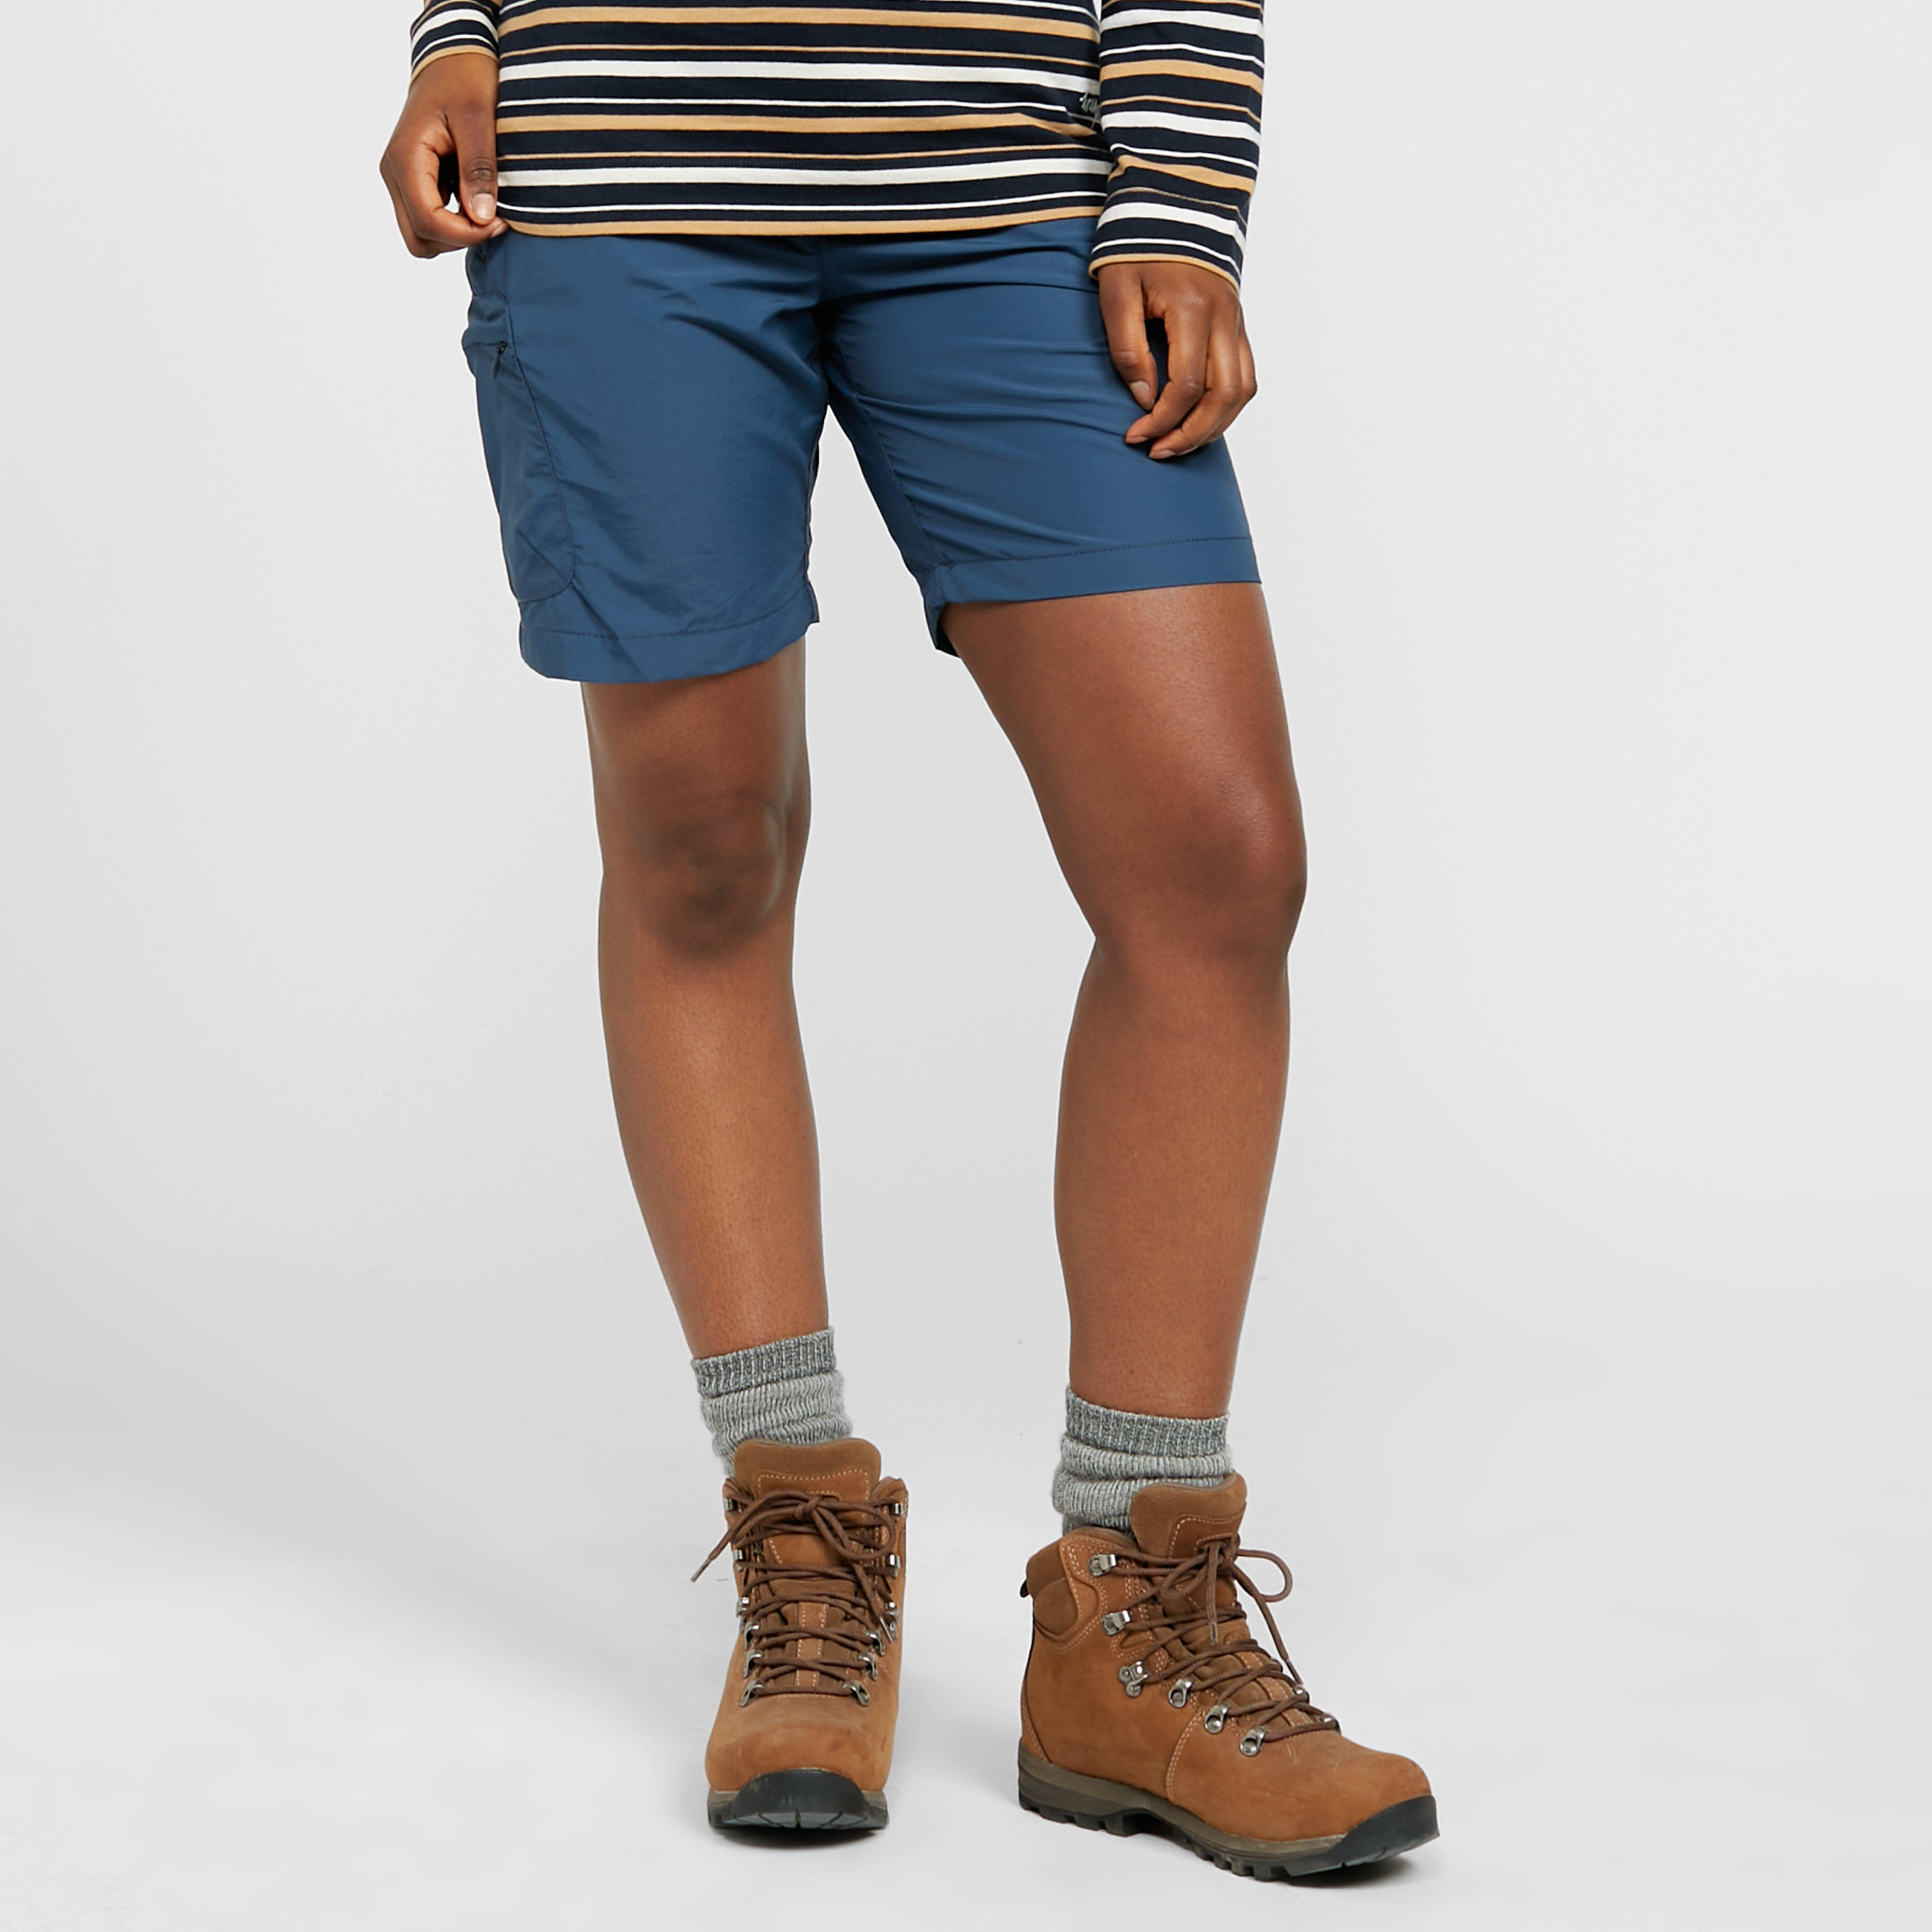 Regatta Women's Chaska Ii Shorts - Blue, Blue